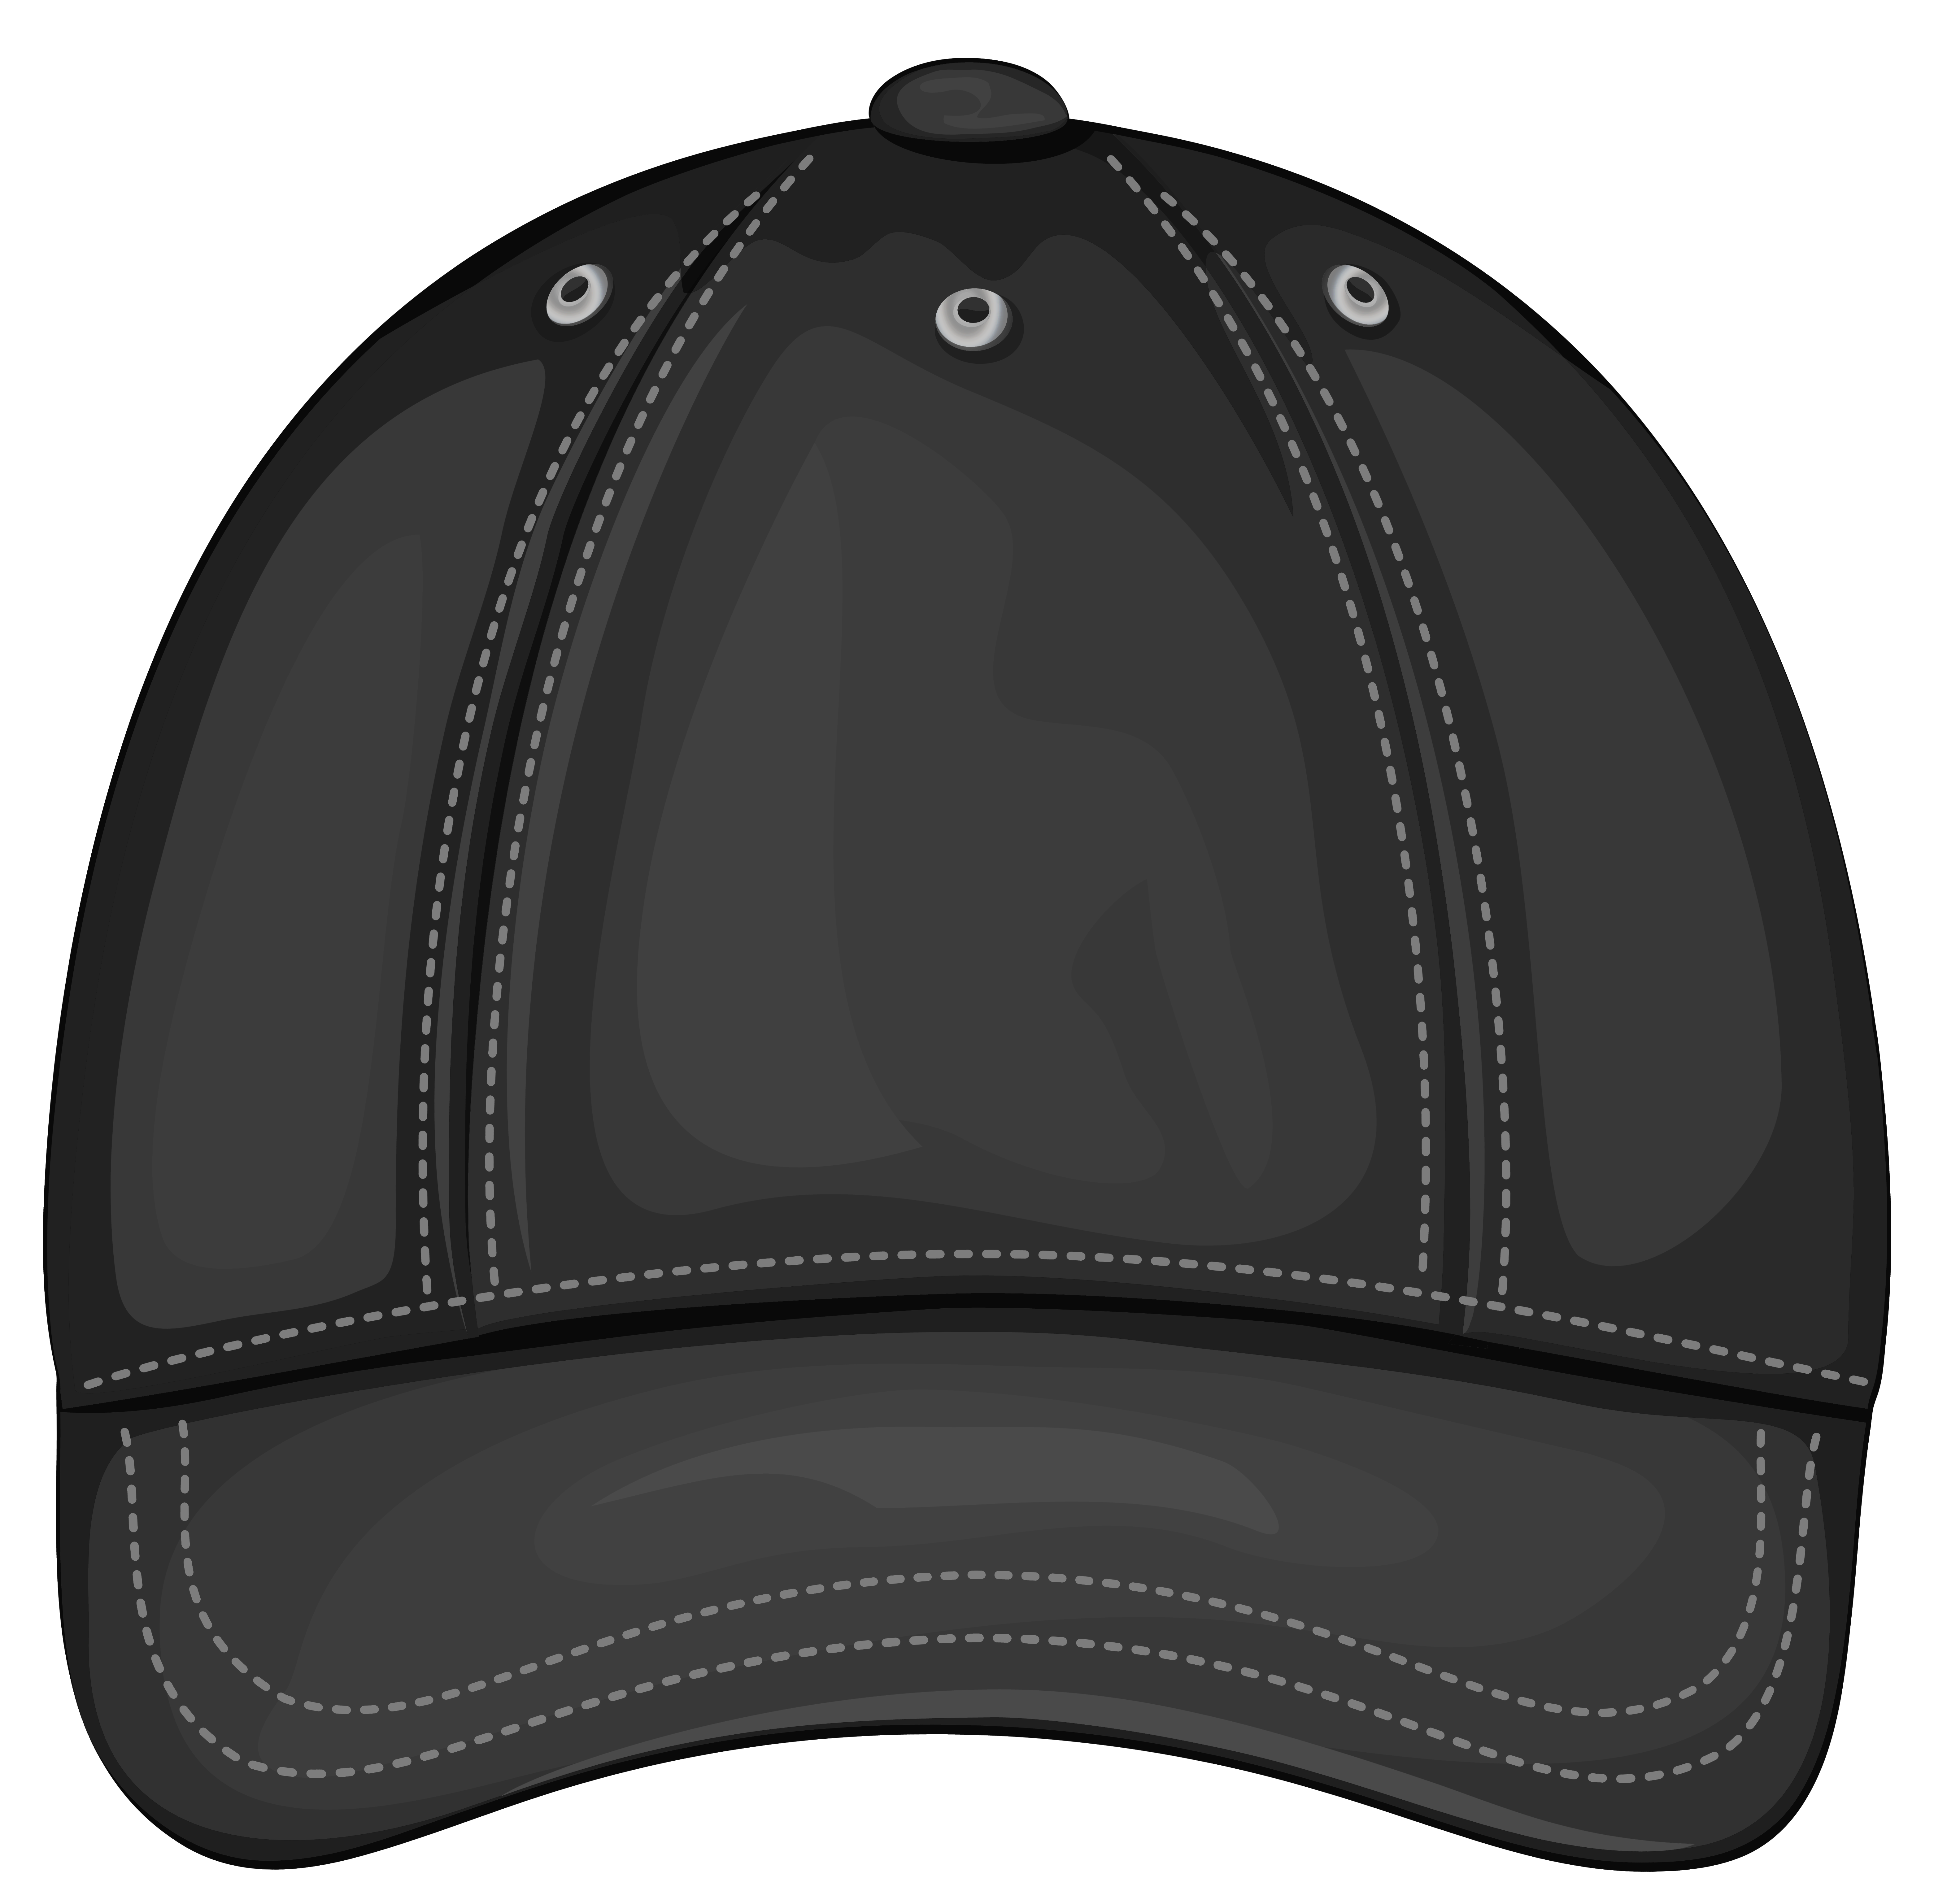 Black baseball cap clipart vector royalty free stock Black Baseball Cap Front PNG Clipart - Best WEB Clipart vector royalty free stock